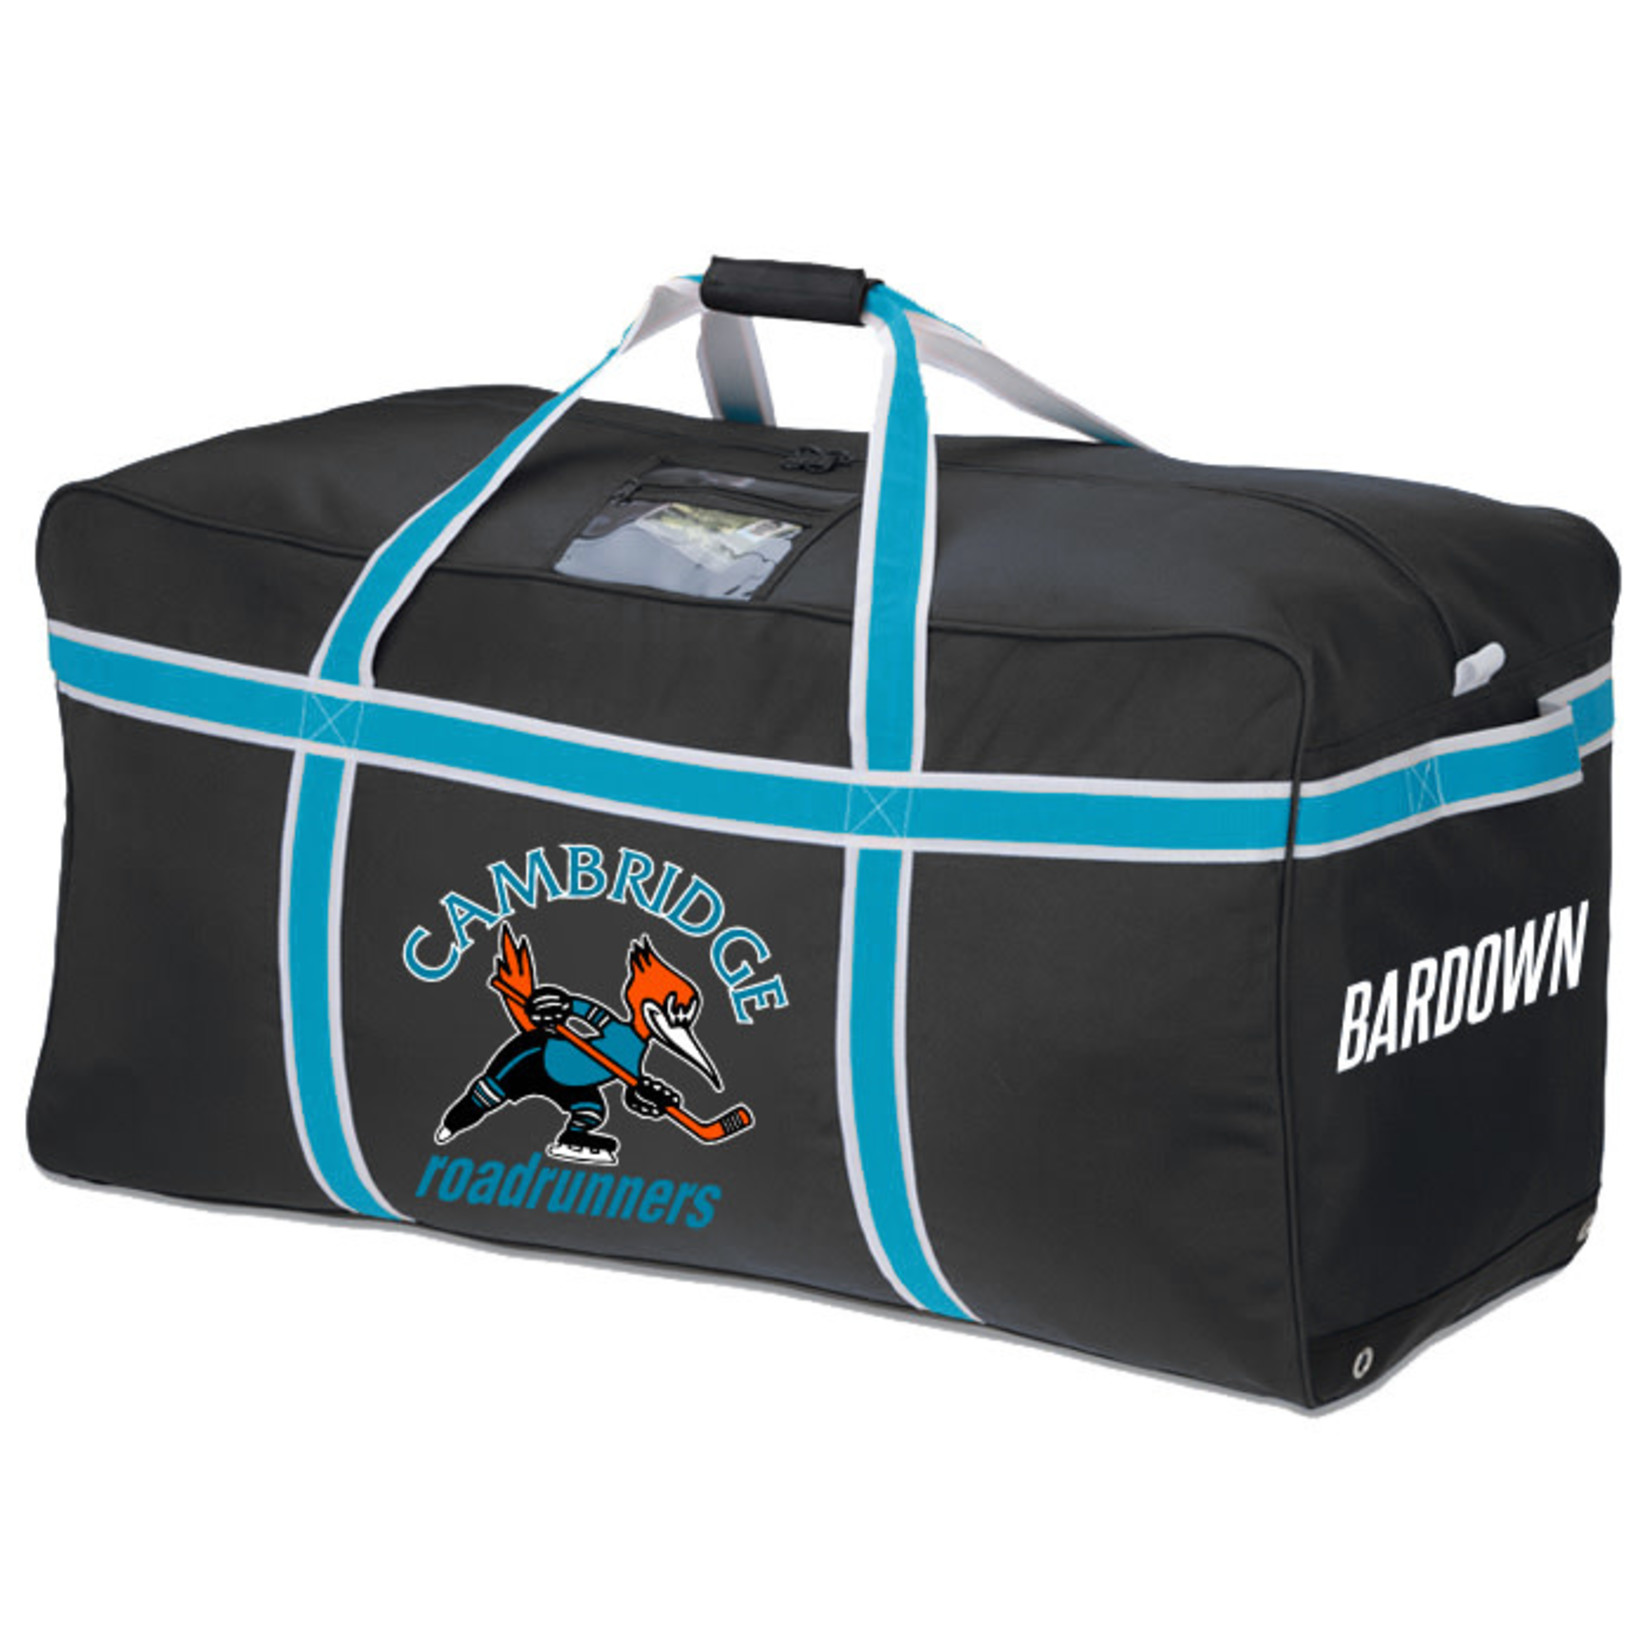 Bardown Roadrunners JR Bag - PRE ORDER